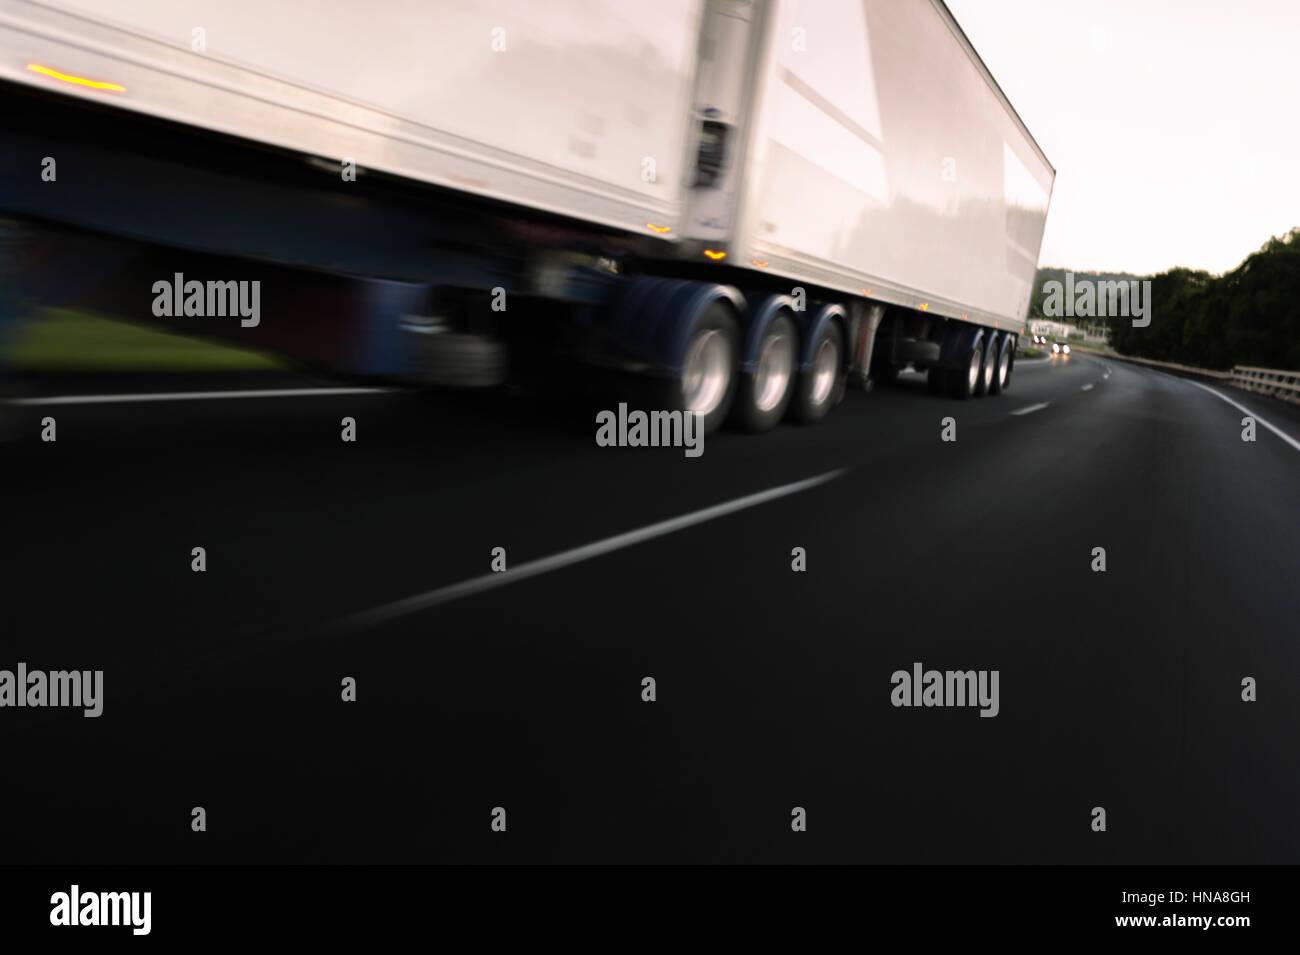 Semi Trailer Stock Photos Amp Semi Trailer Stock Images Alamy